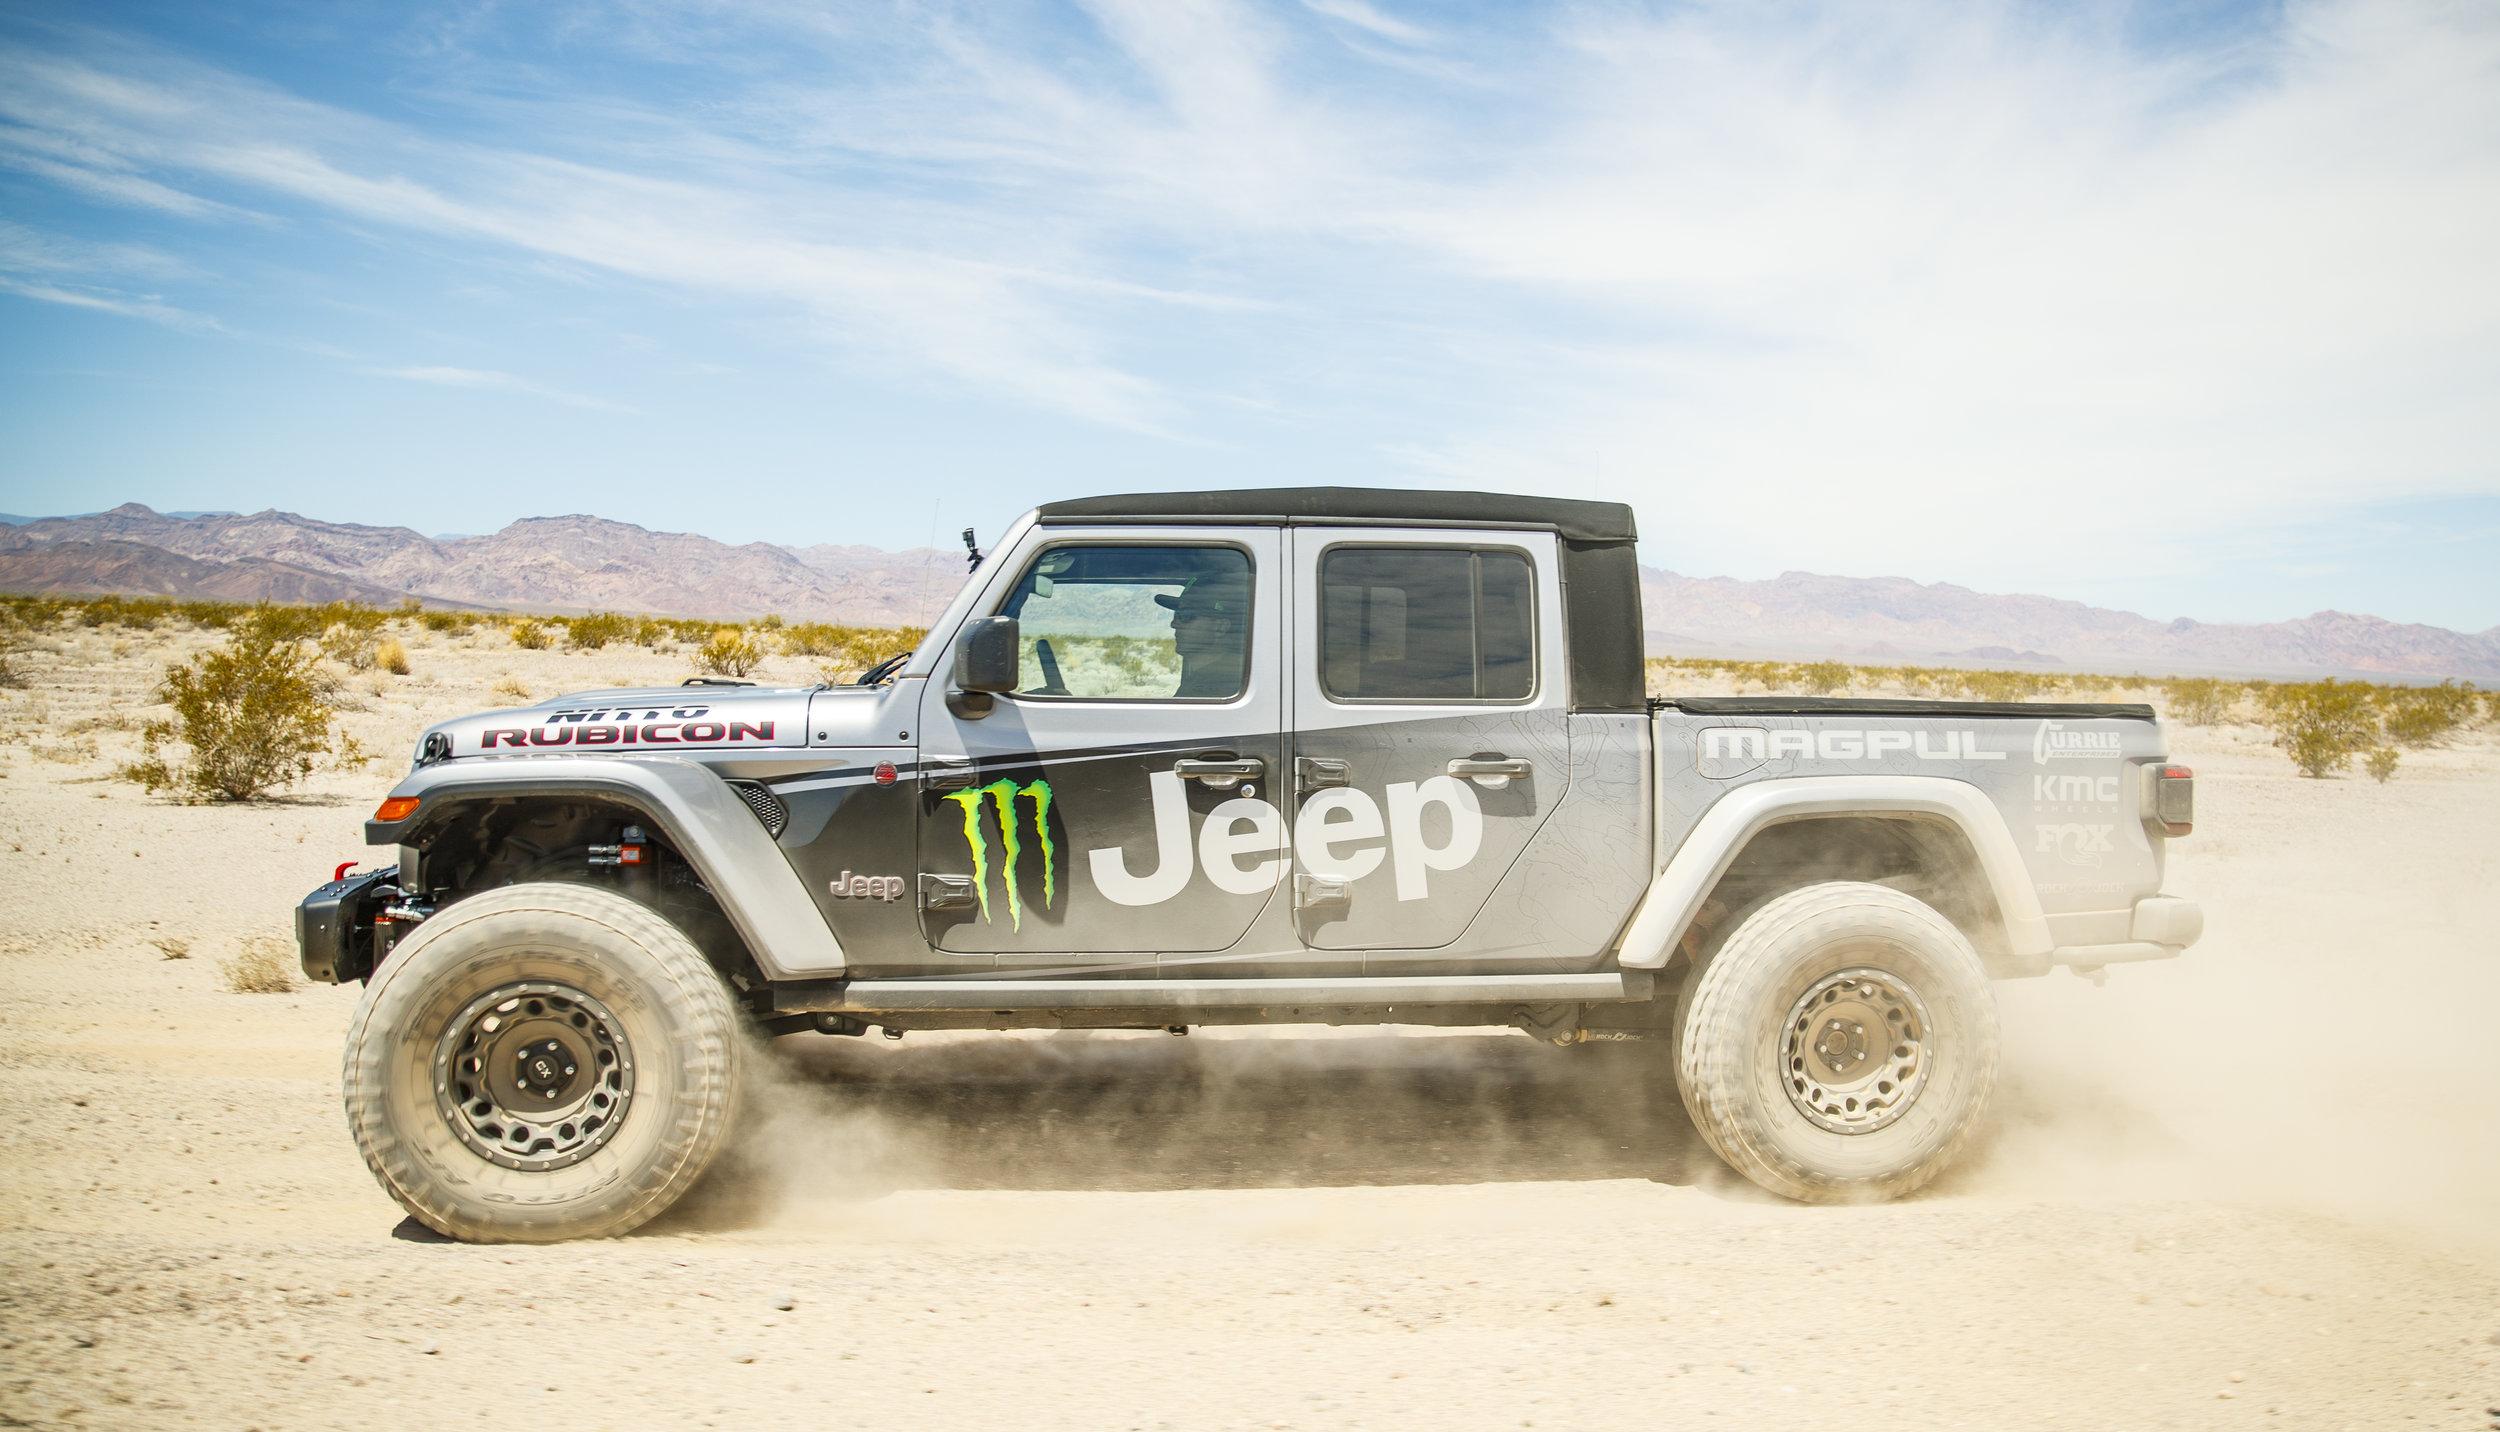 6_24_CaseyCurrie_Baja500PreRunning_BajaMexico_Jeep_001.jpg